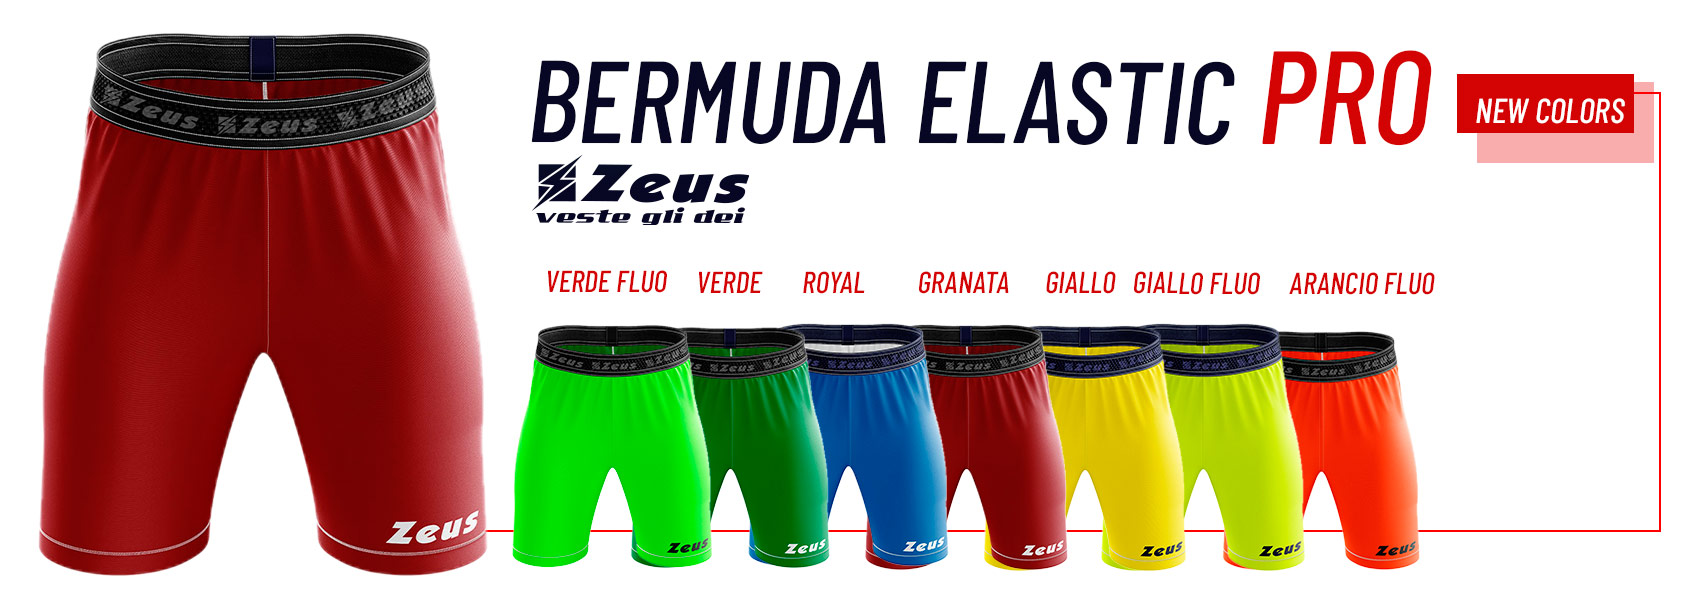 Elastic bermudy Zeus PRO